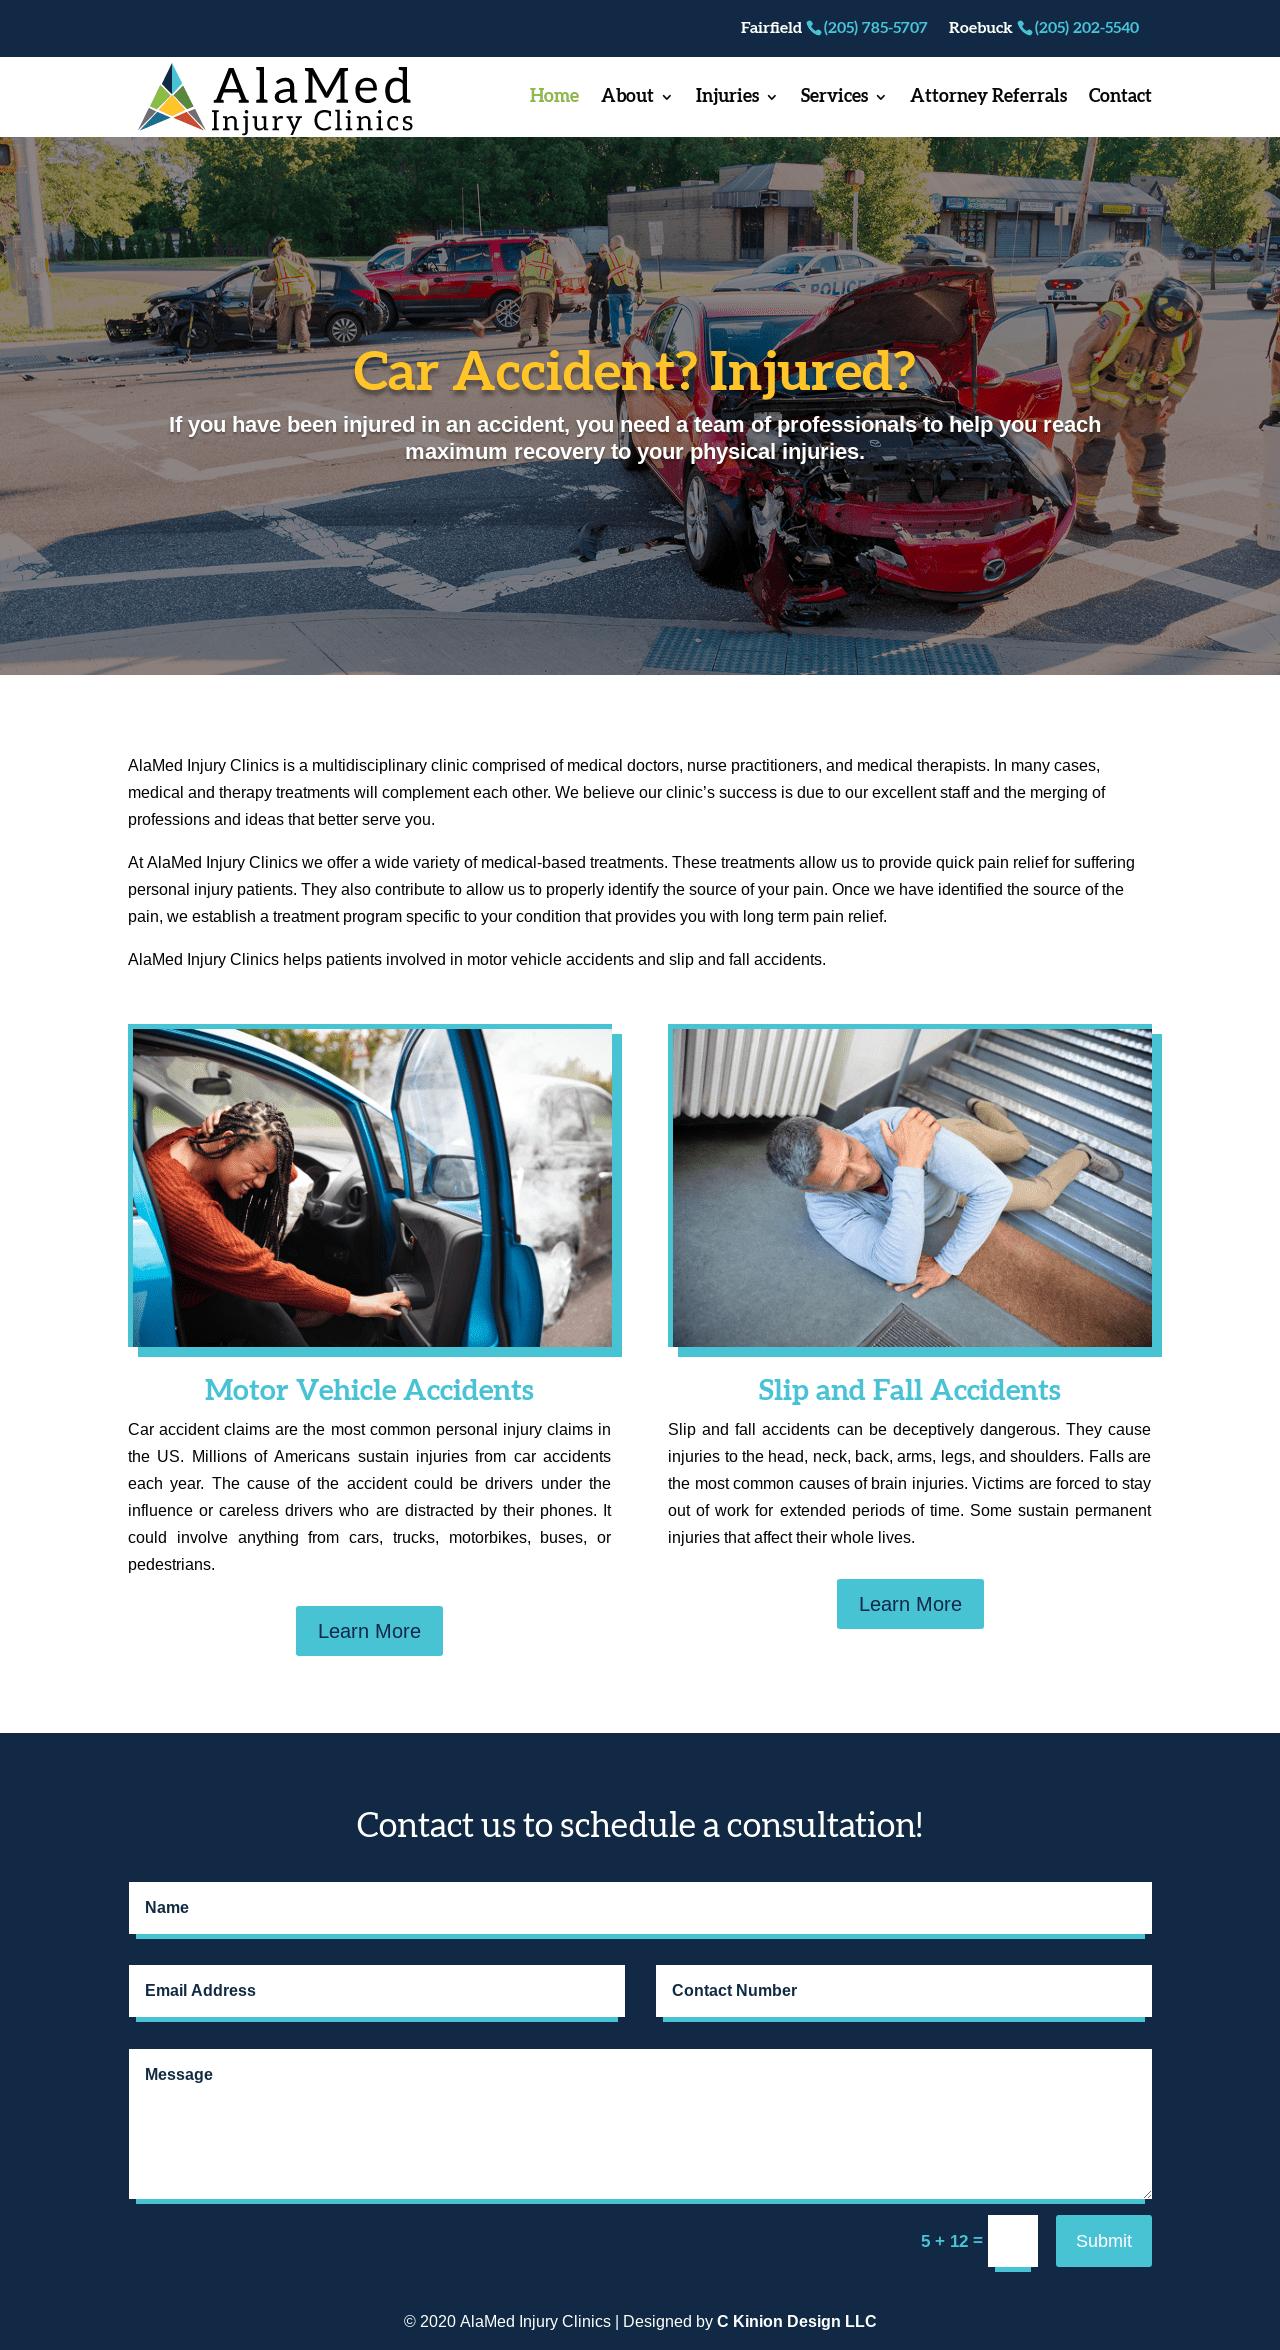 Birmingham-Web-Design-Agency-C-Kinion-Design- AlaMed Injury Clinics -full page